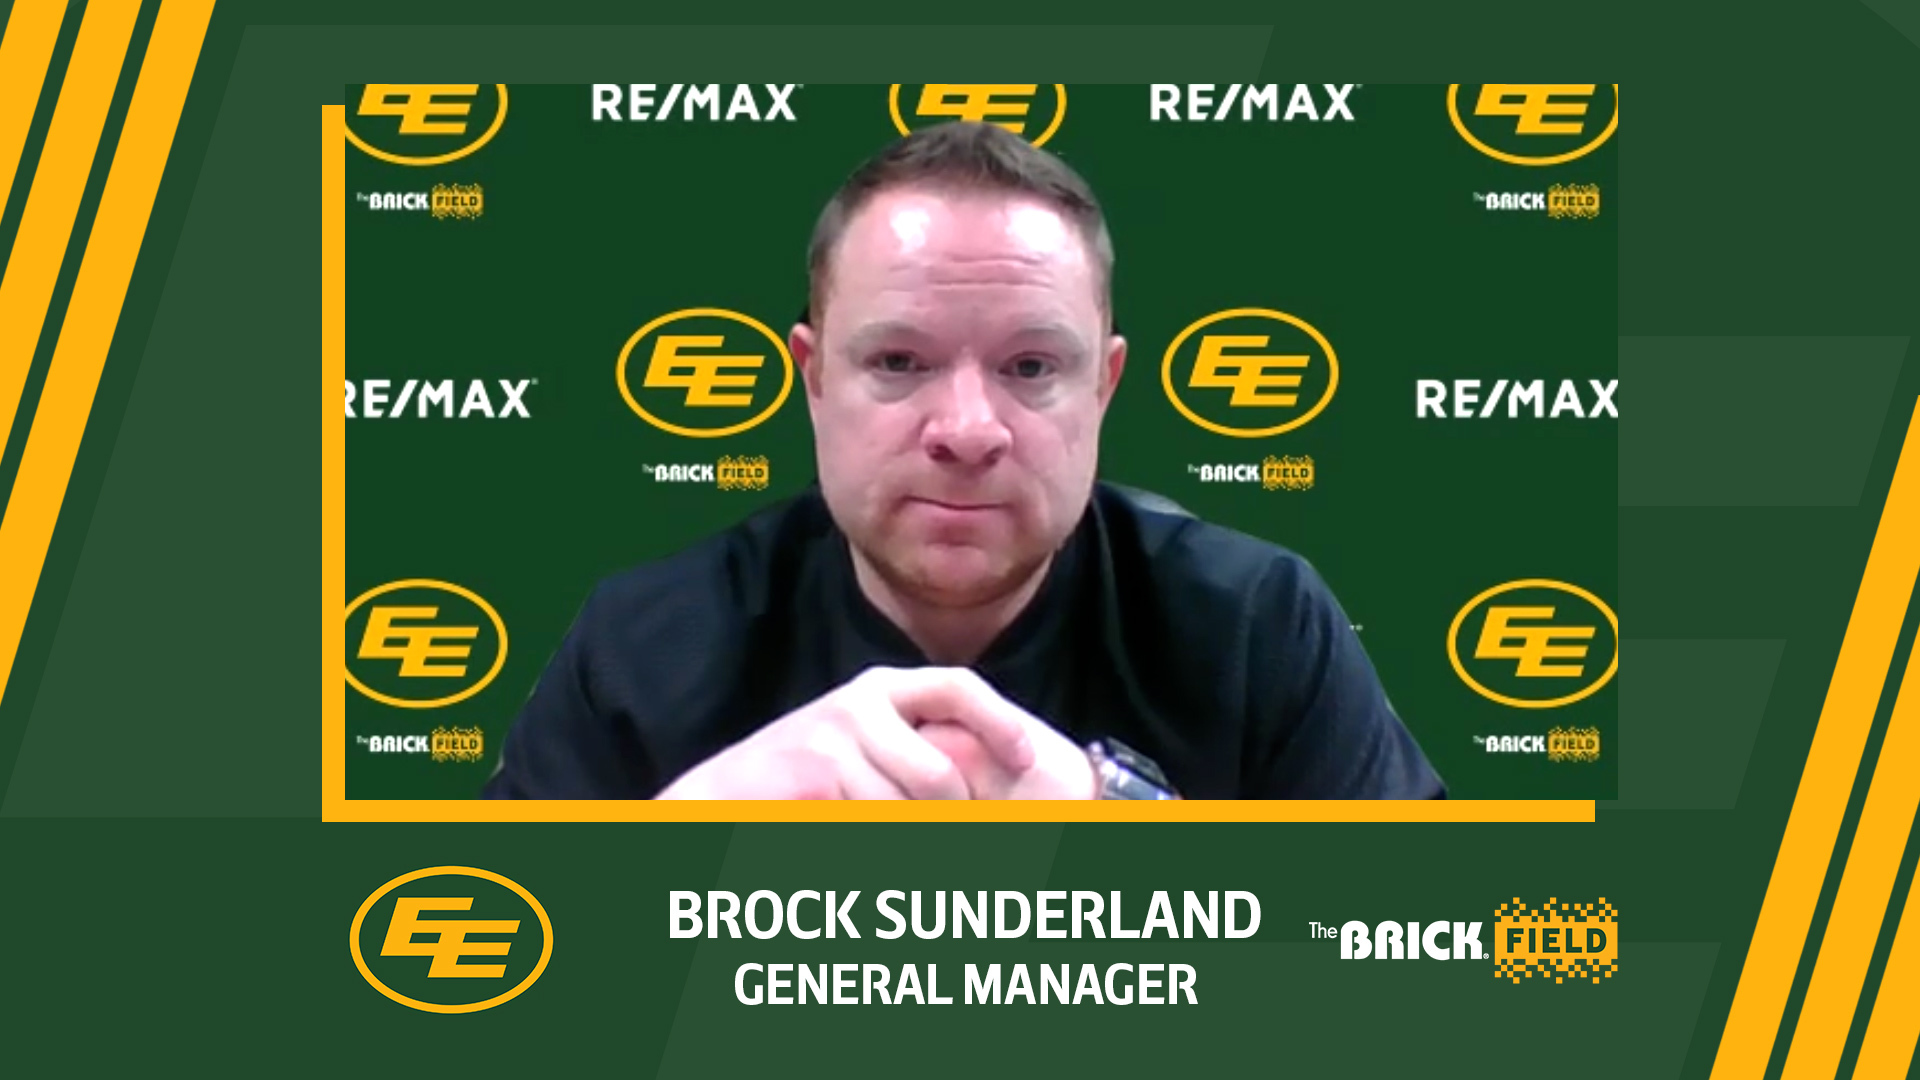 GM/VP Brock Sunderland Talks About the 2021 CFL Draft